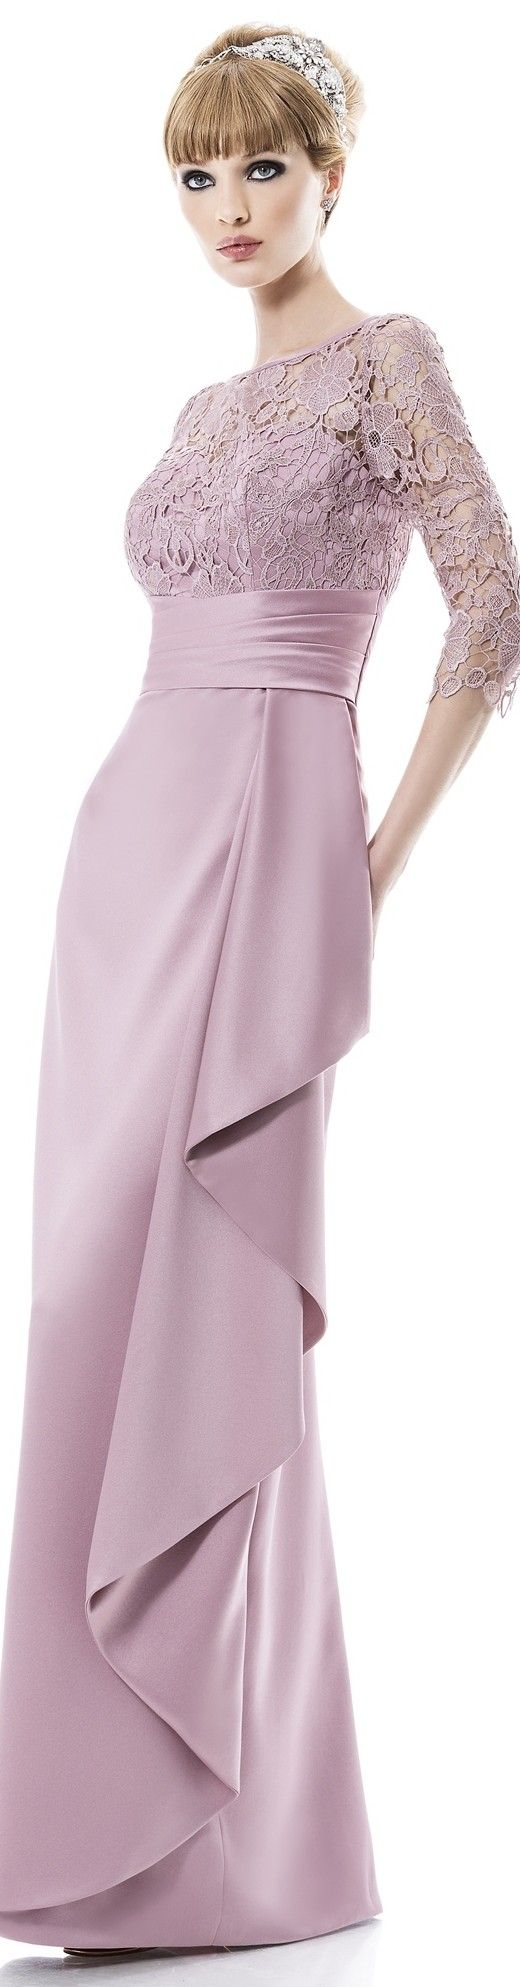 Angela Ariza dress - motheor-the-bride